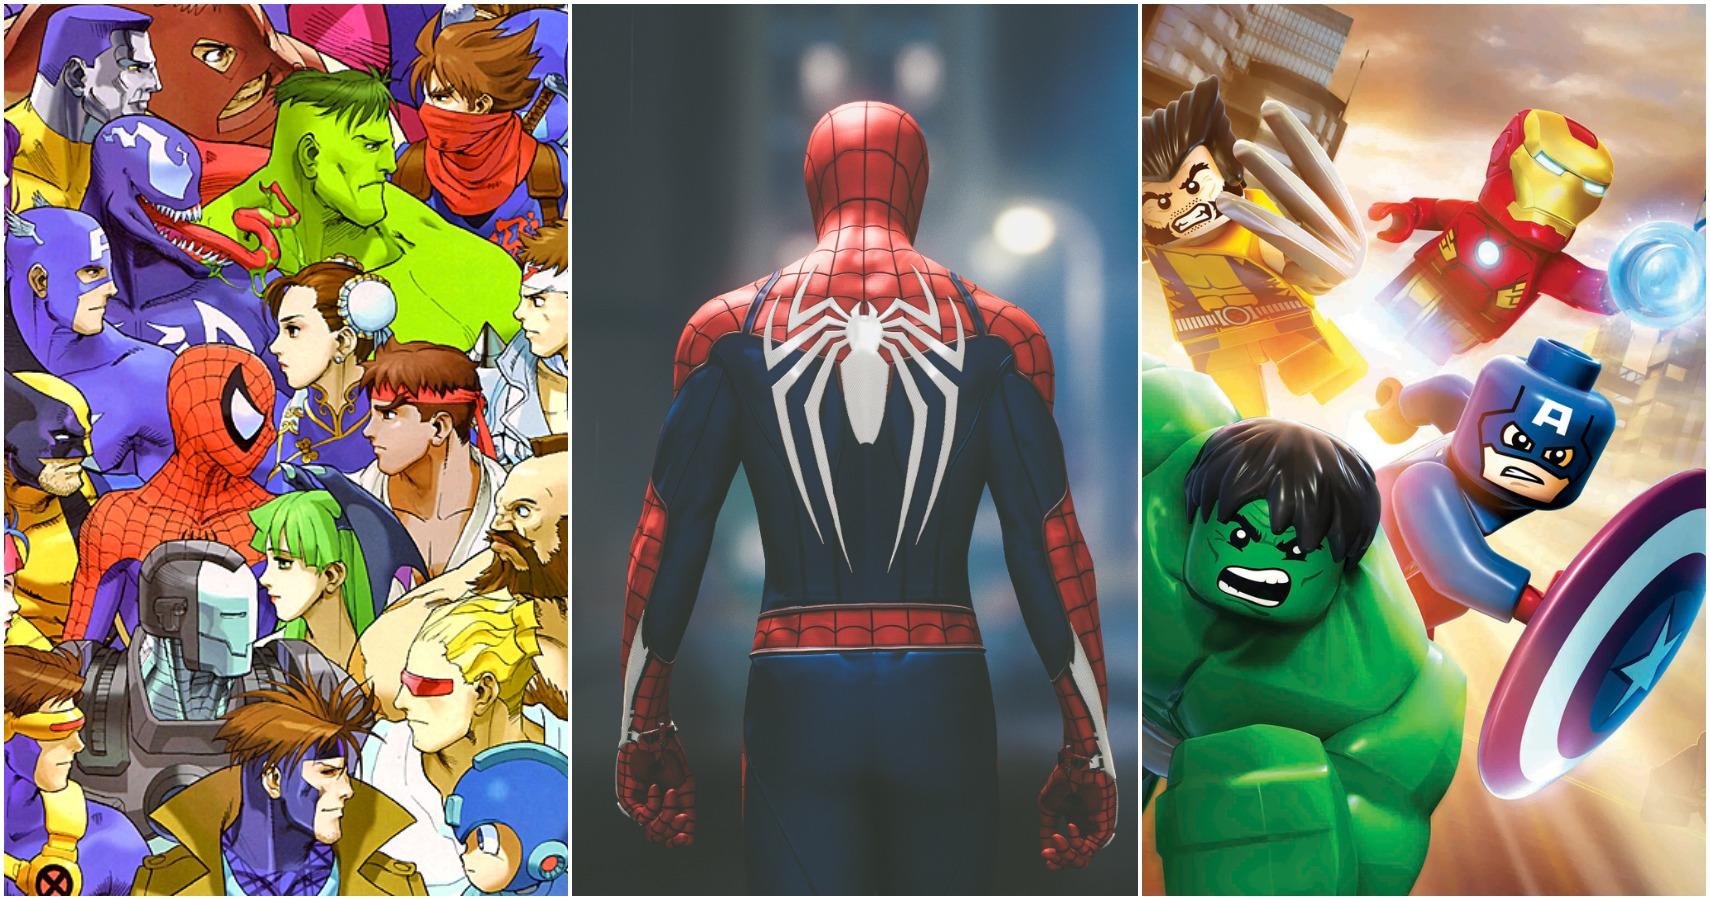 10 Best Marvel Games, Ranked (According